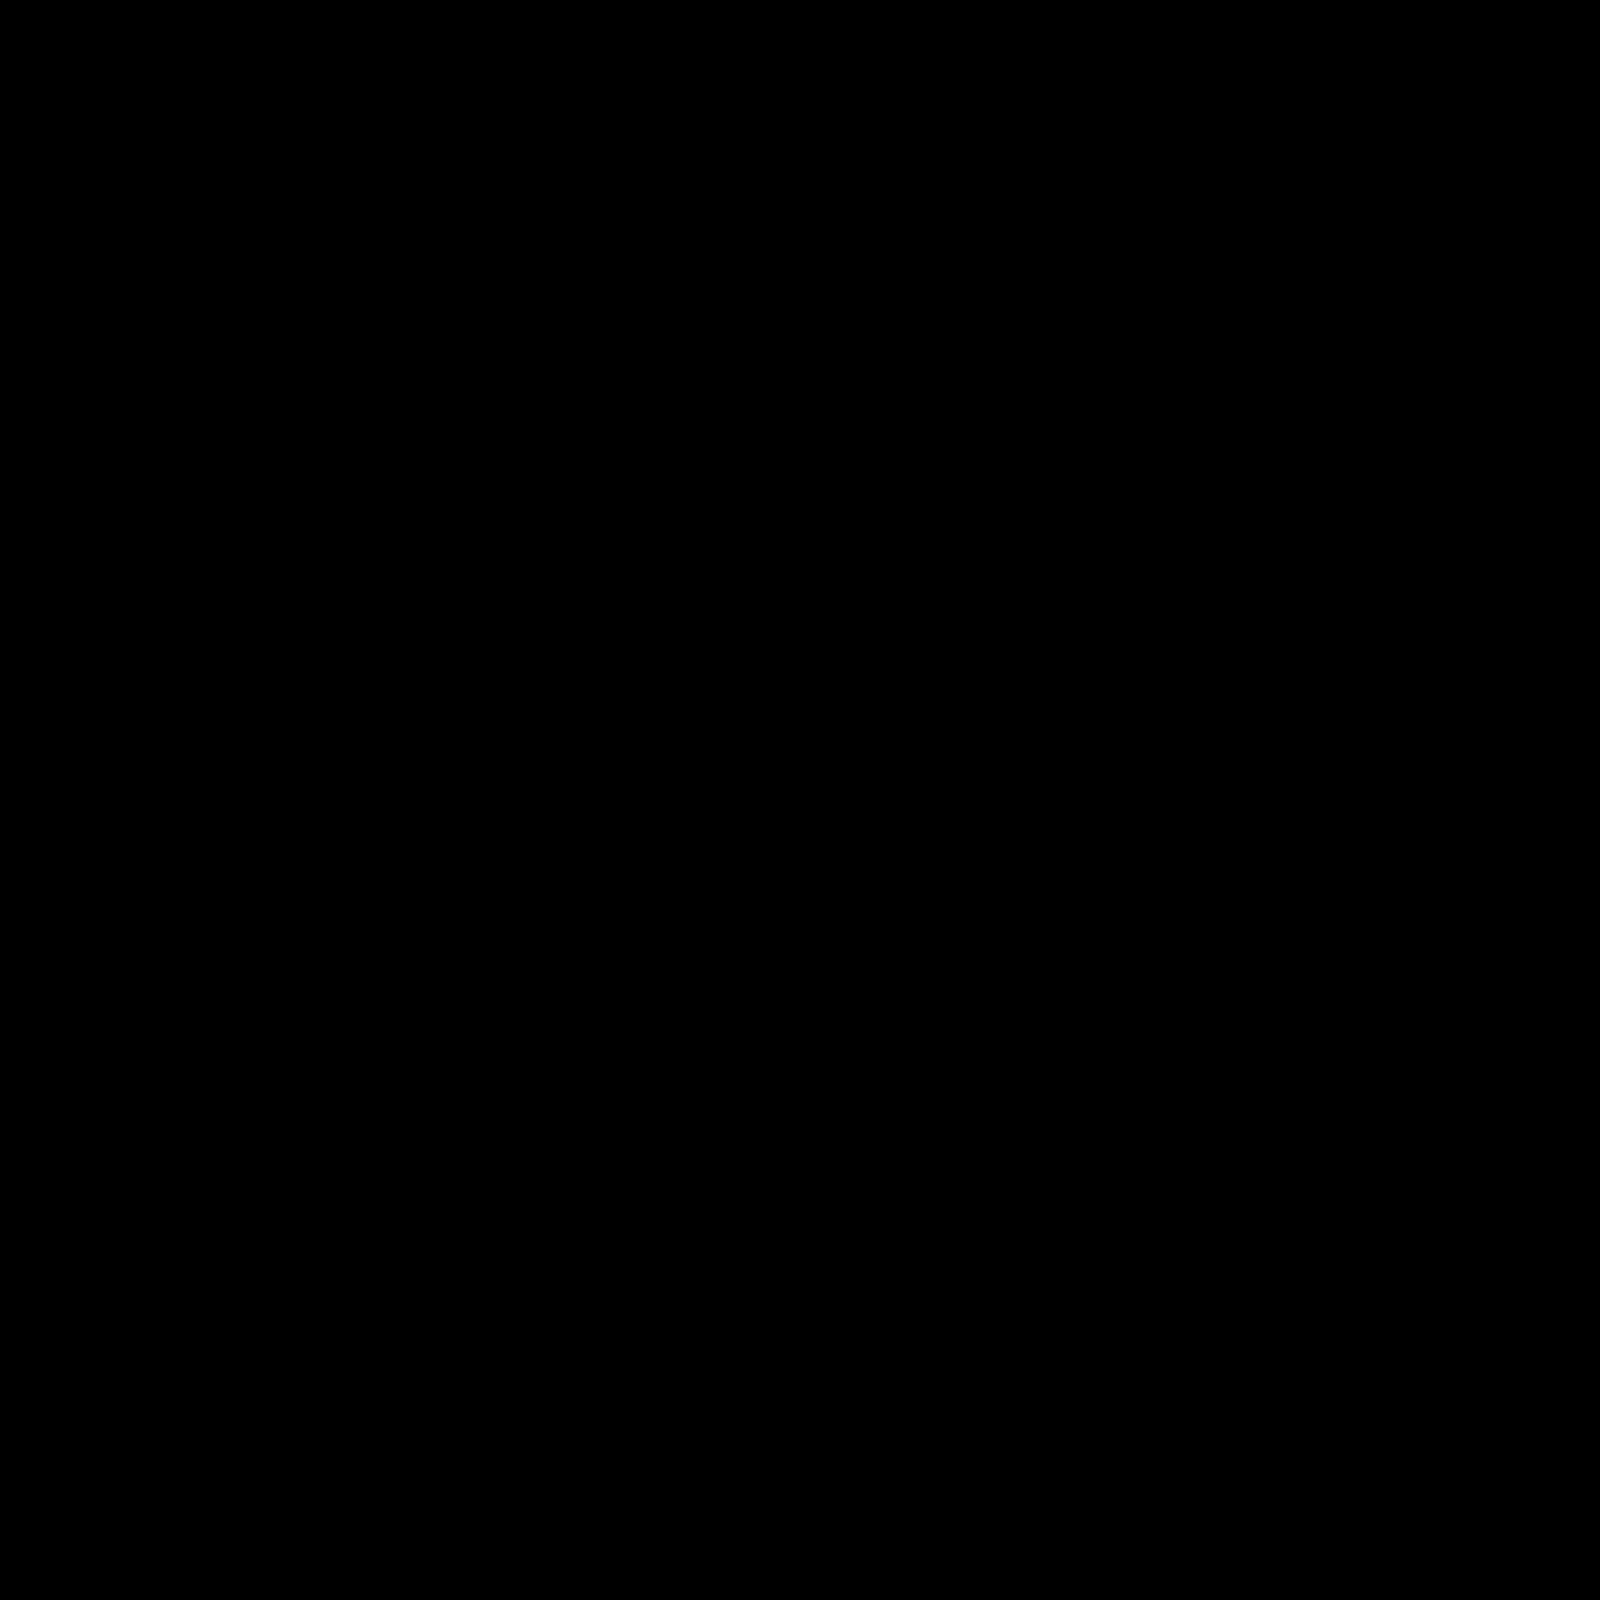 Majlis Tent icon